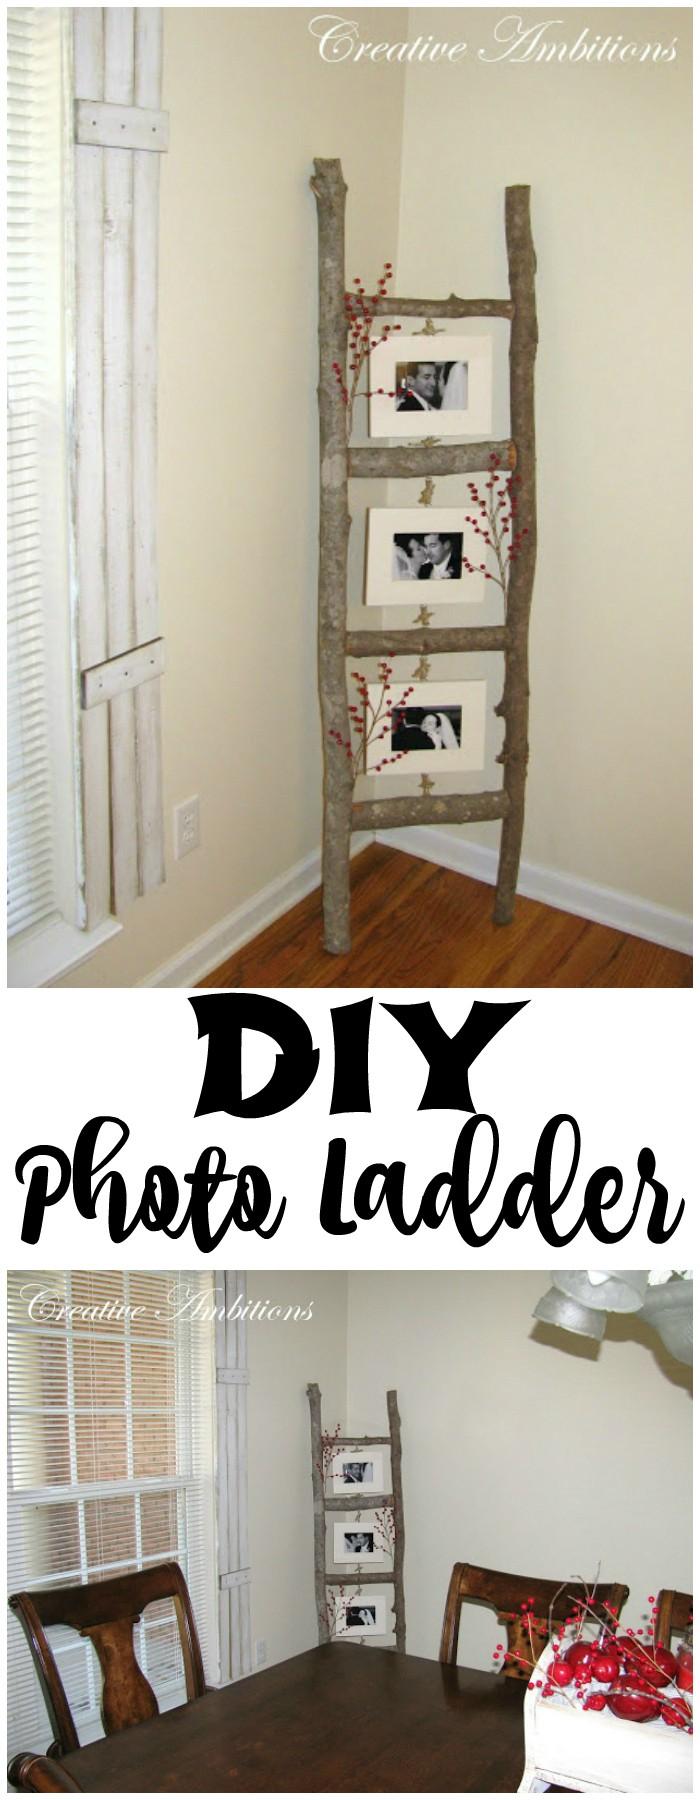 Rustic DIY Photo Ladder